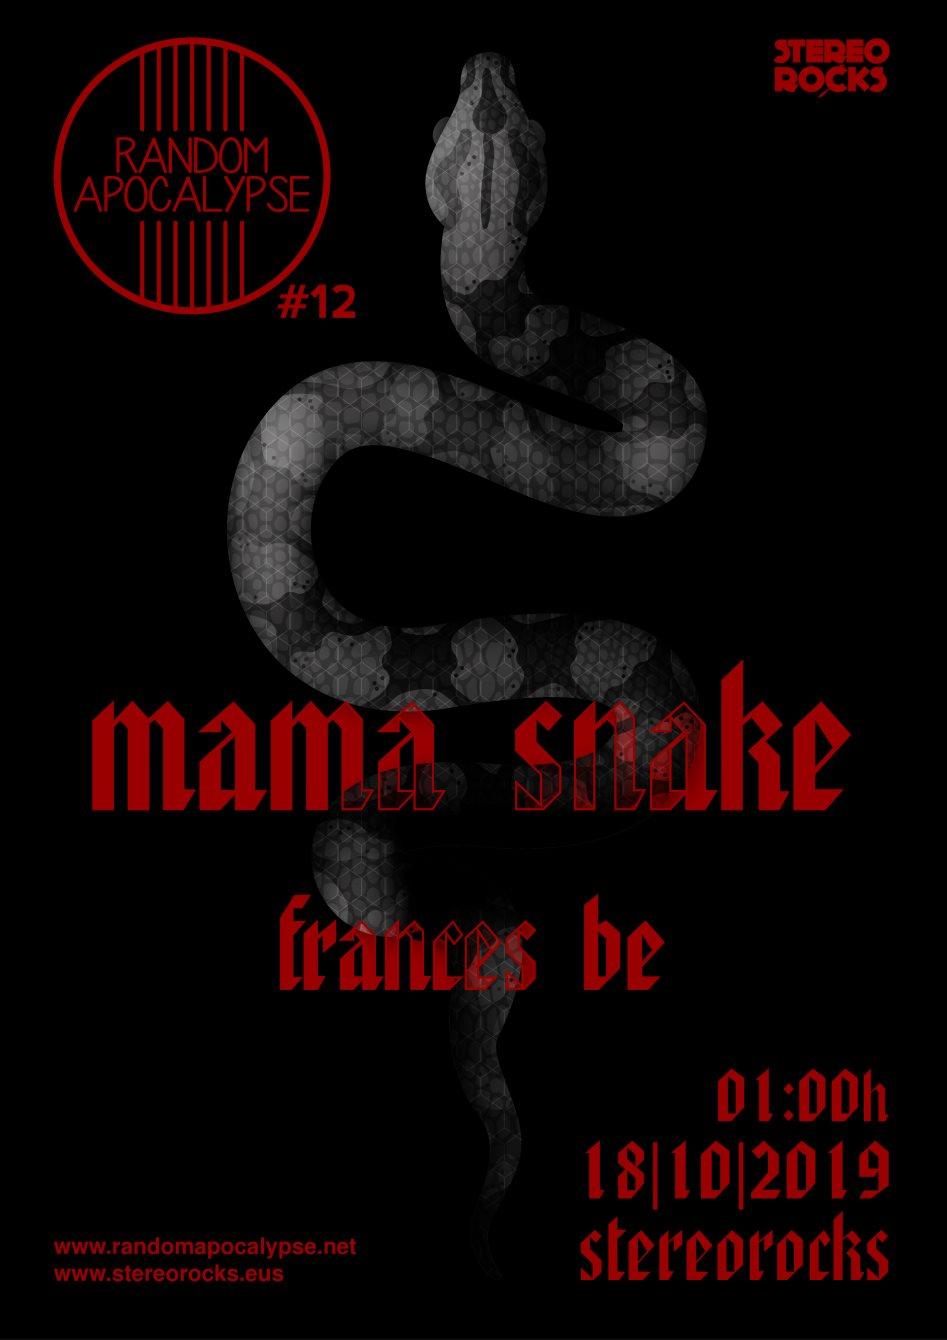 Random Apocalypse #12: Mama Snake + Frances Be - Flyer front